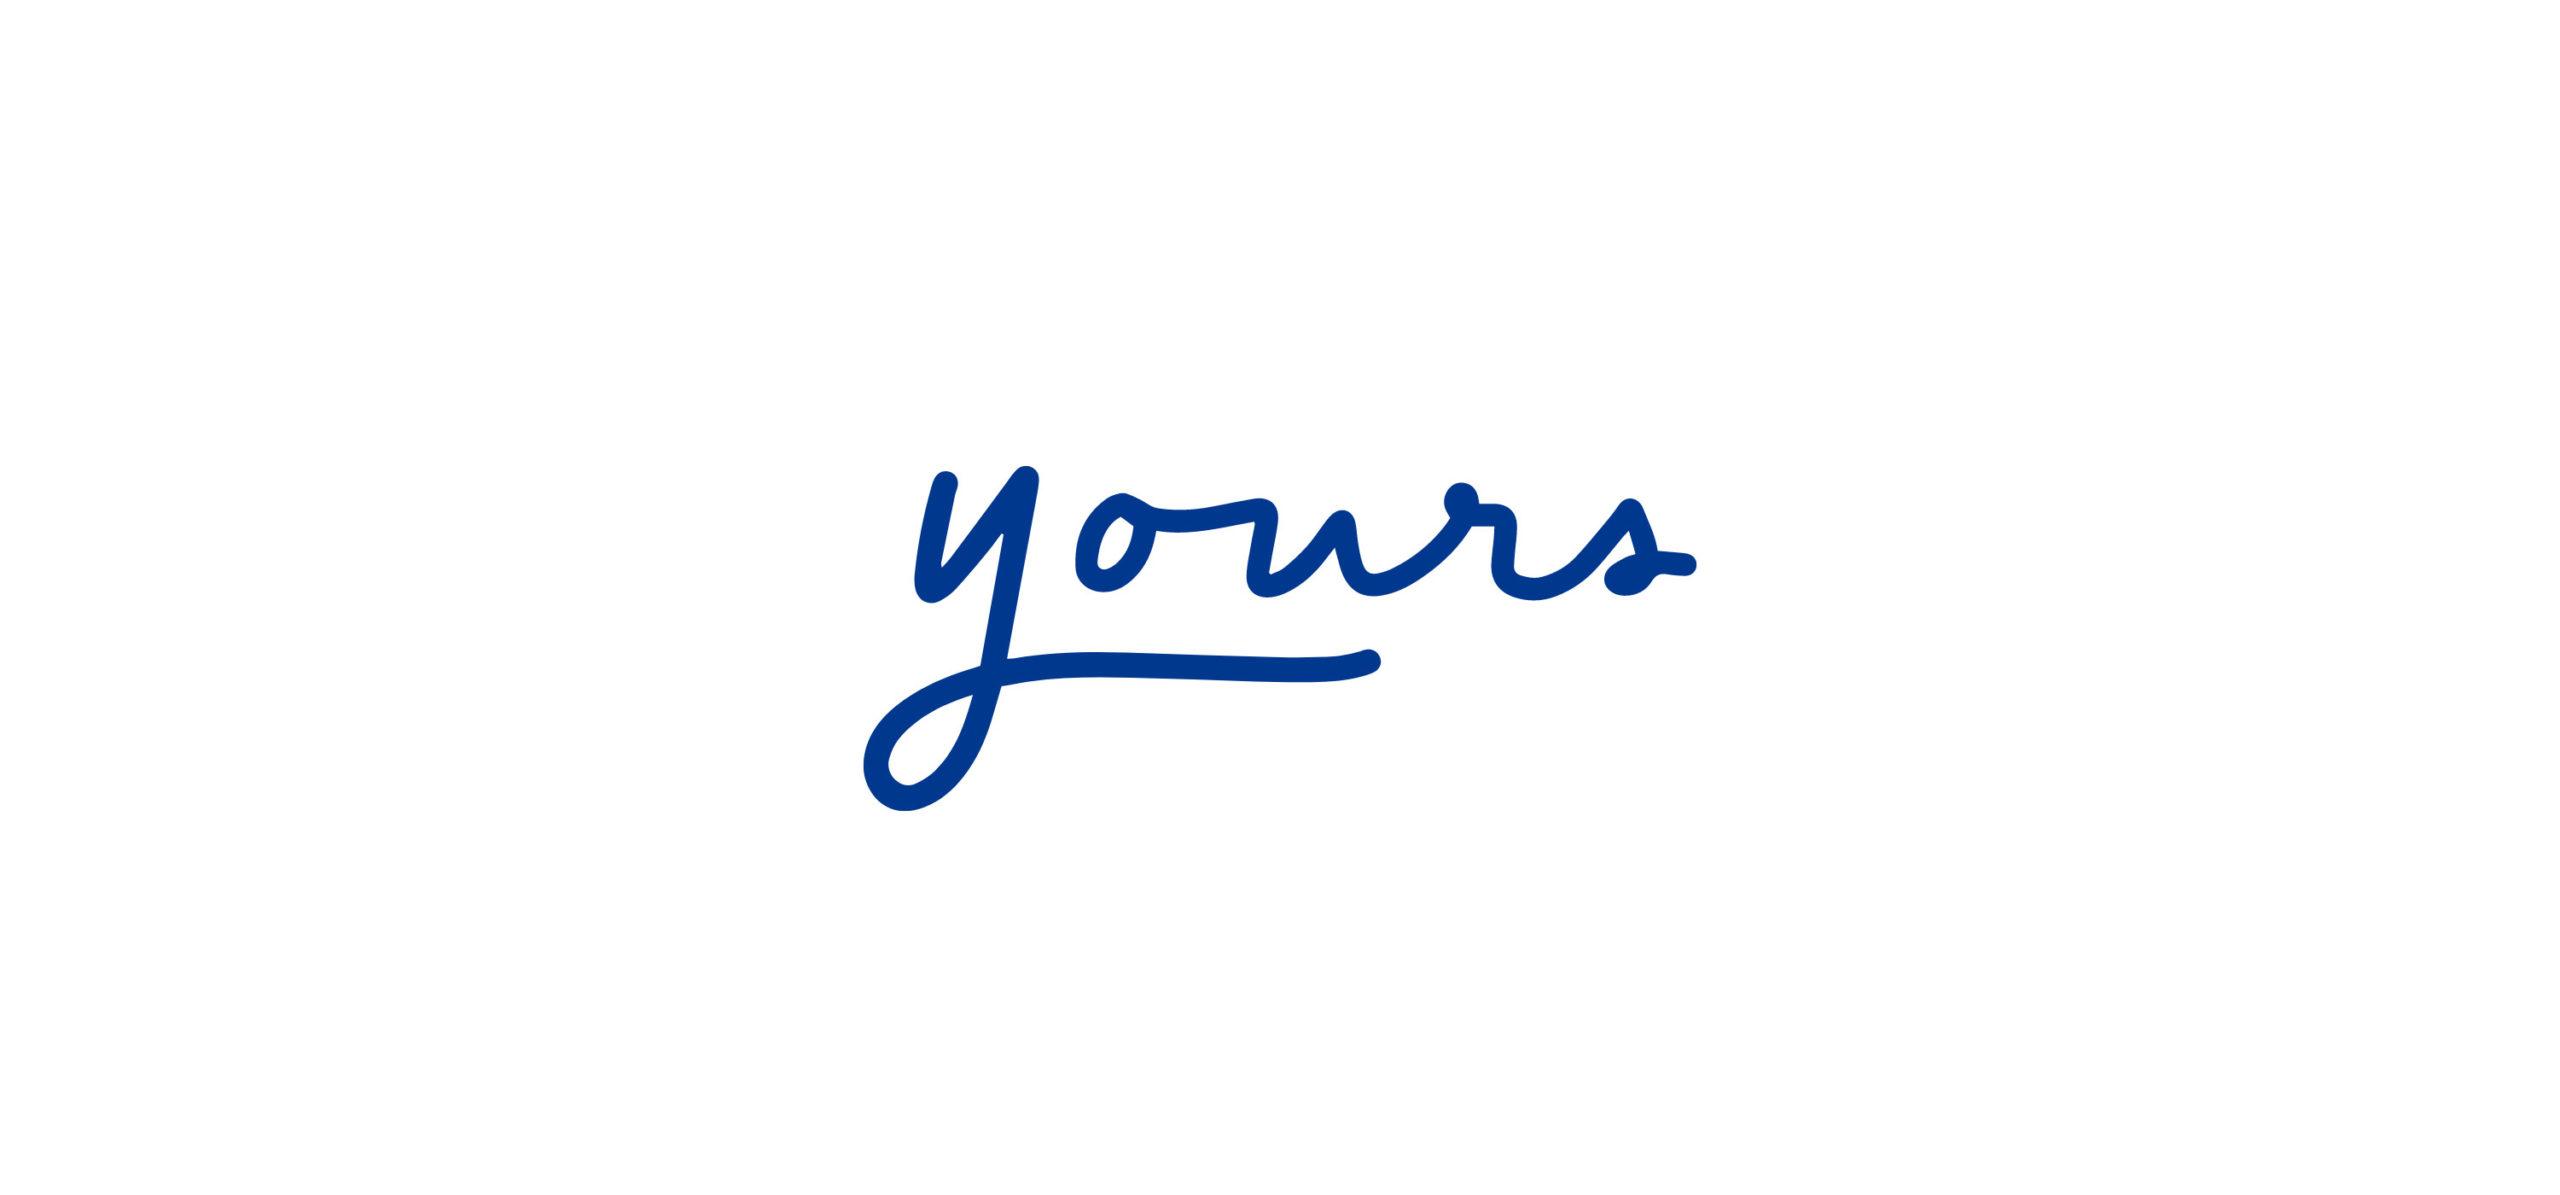 life-coach-logo-design-hand-lettering